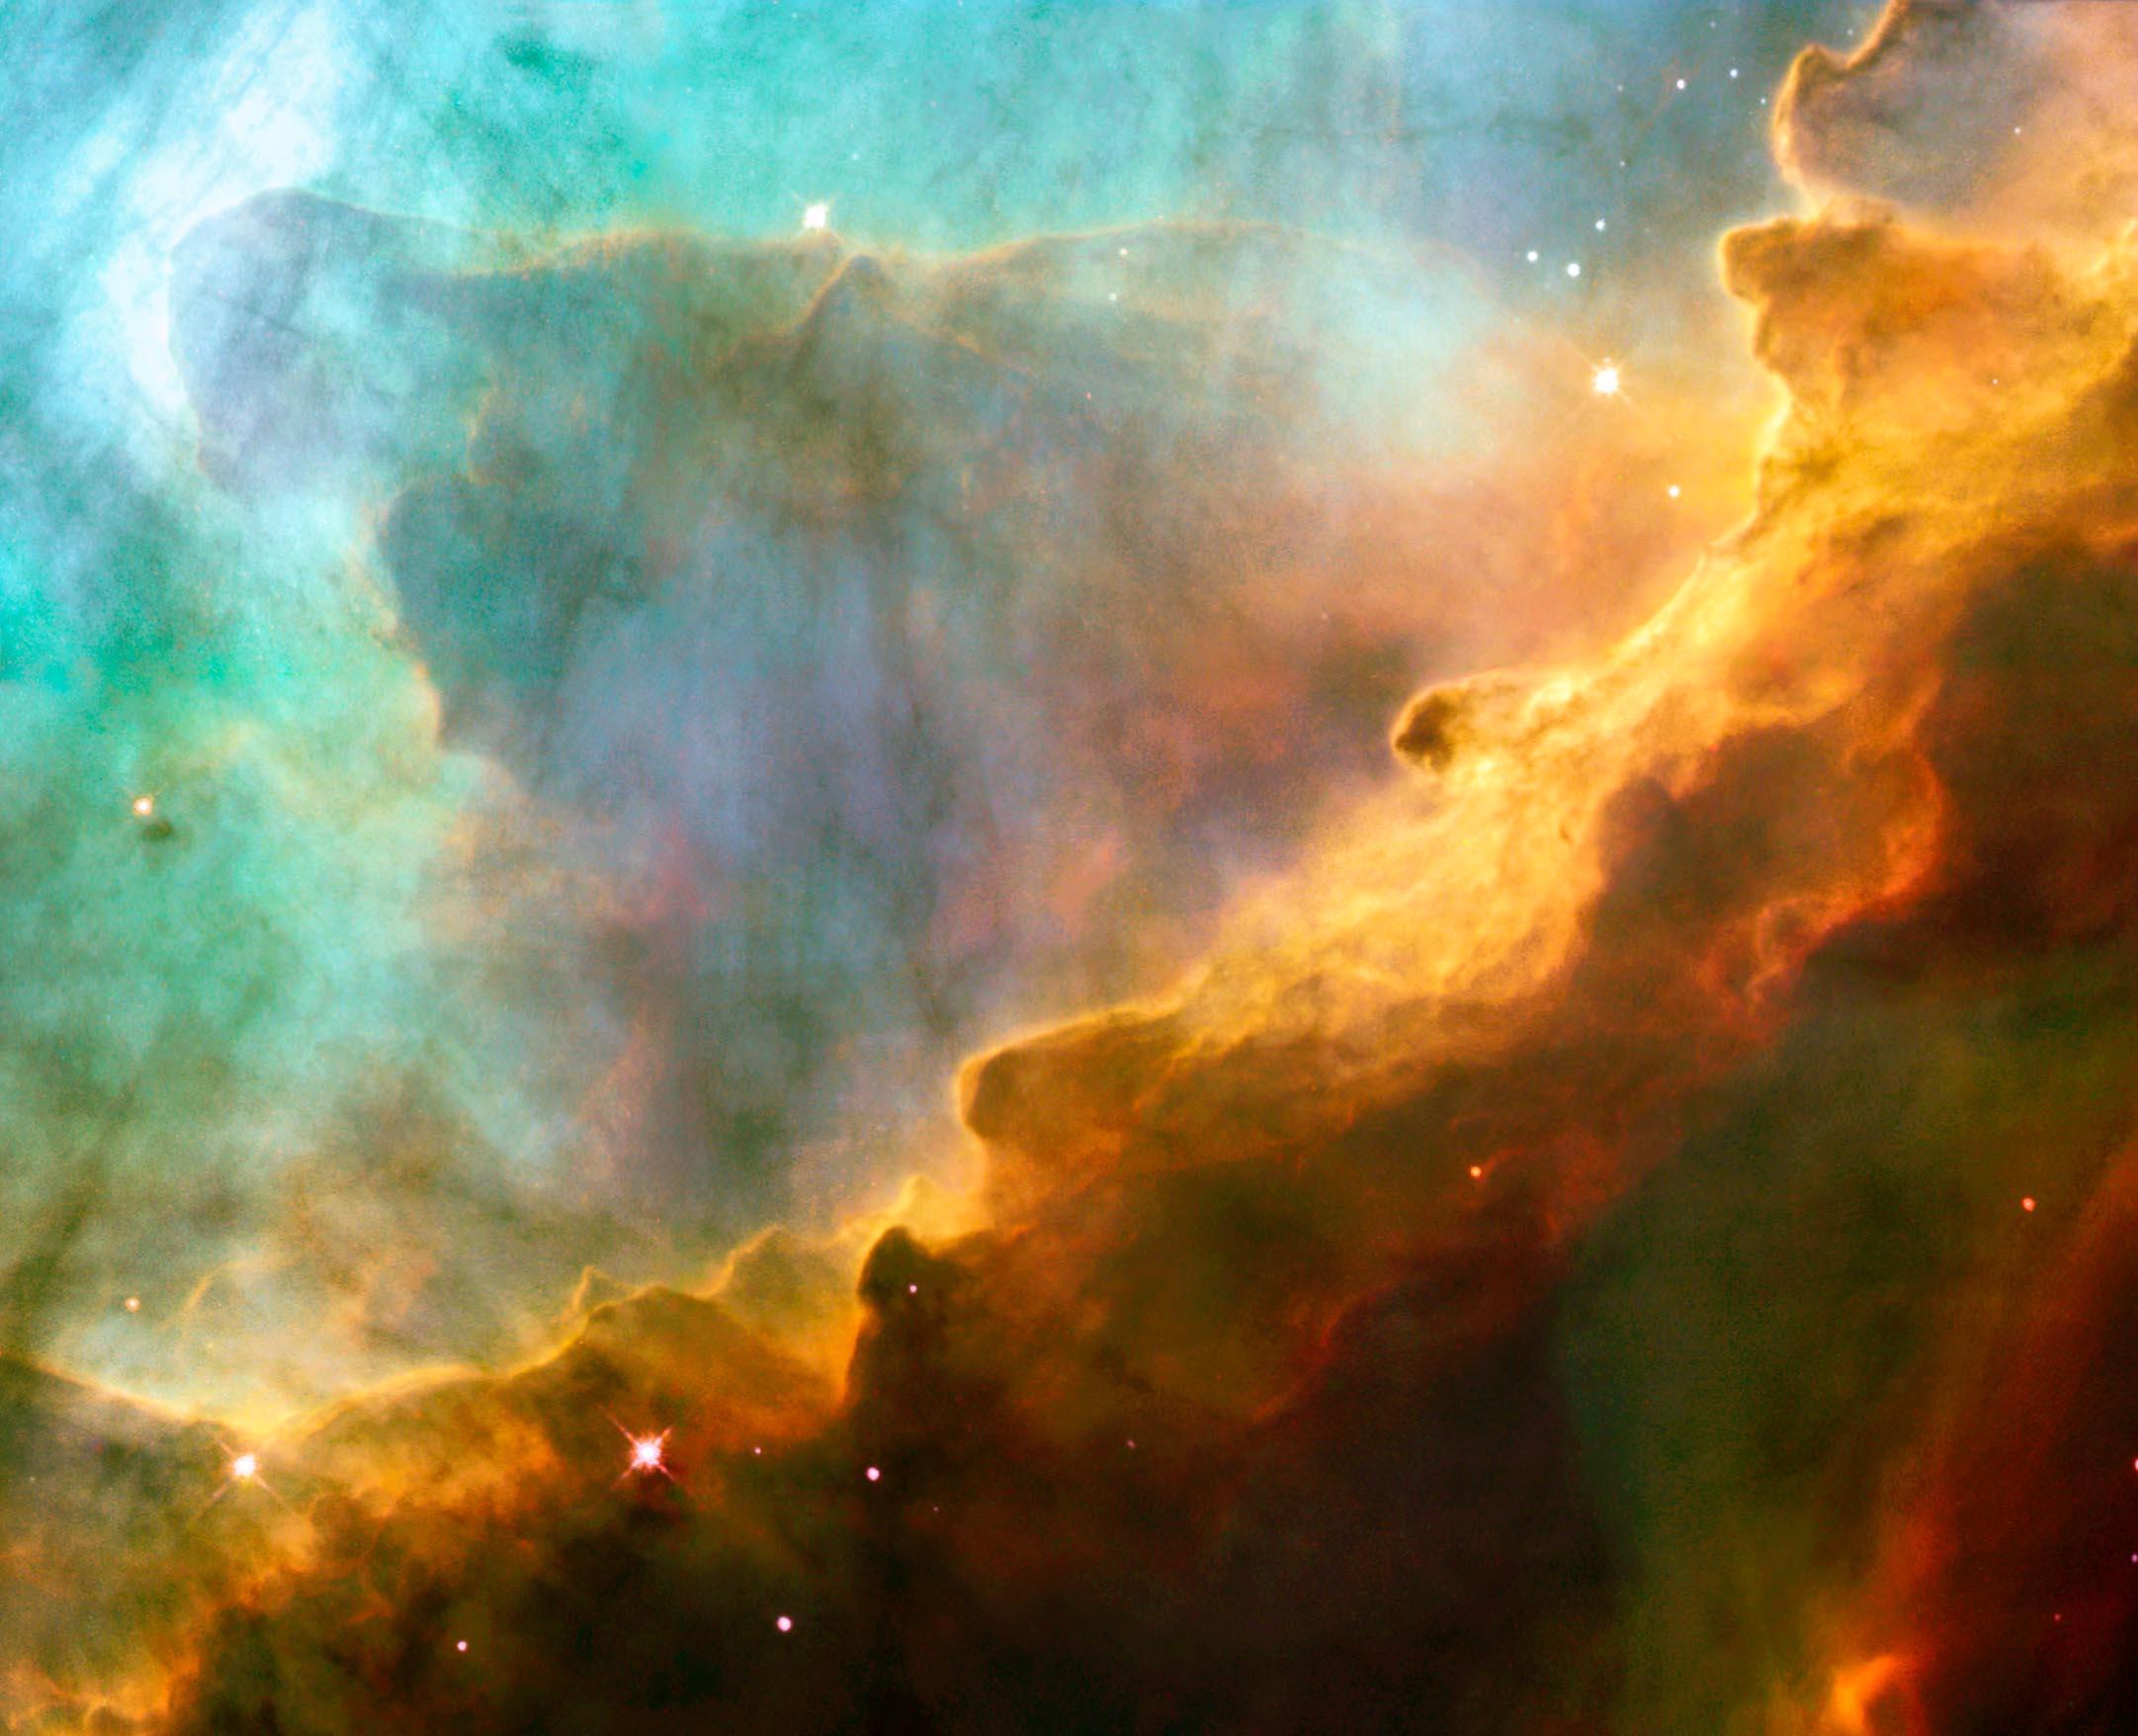 Nebulae - Astronomy For Kids - KidsAstronomy.com